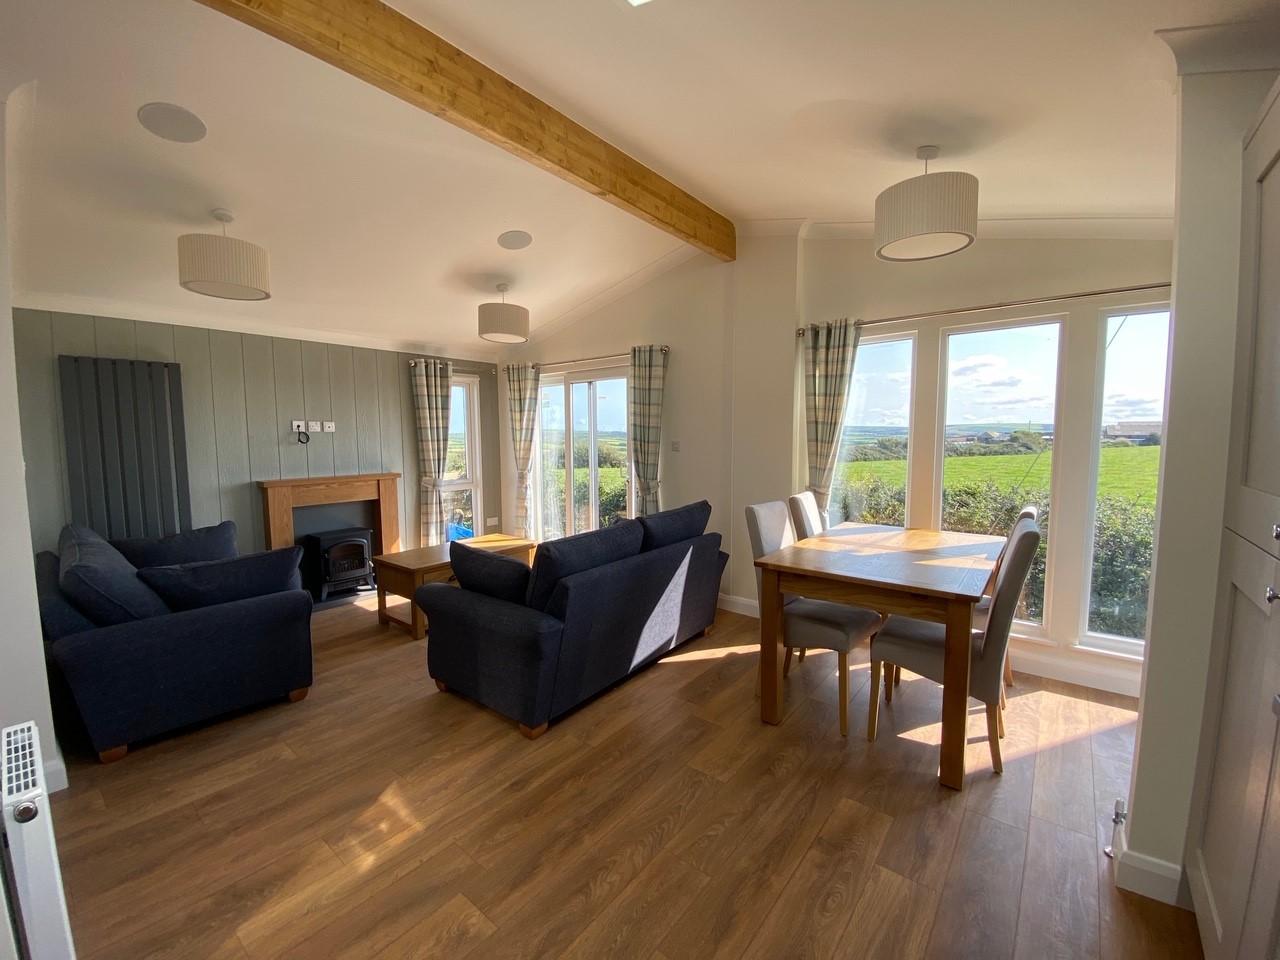 Willerby-Bespoke-Acorn-Lodge-3